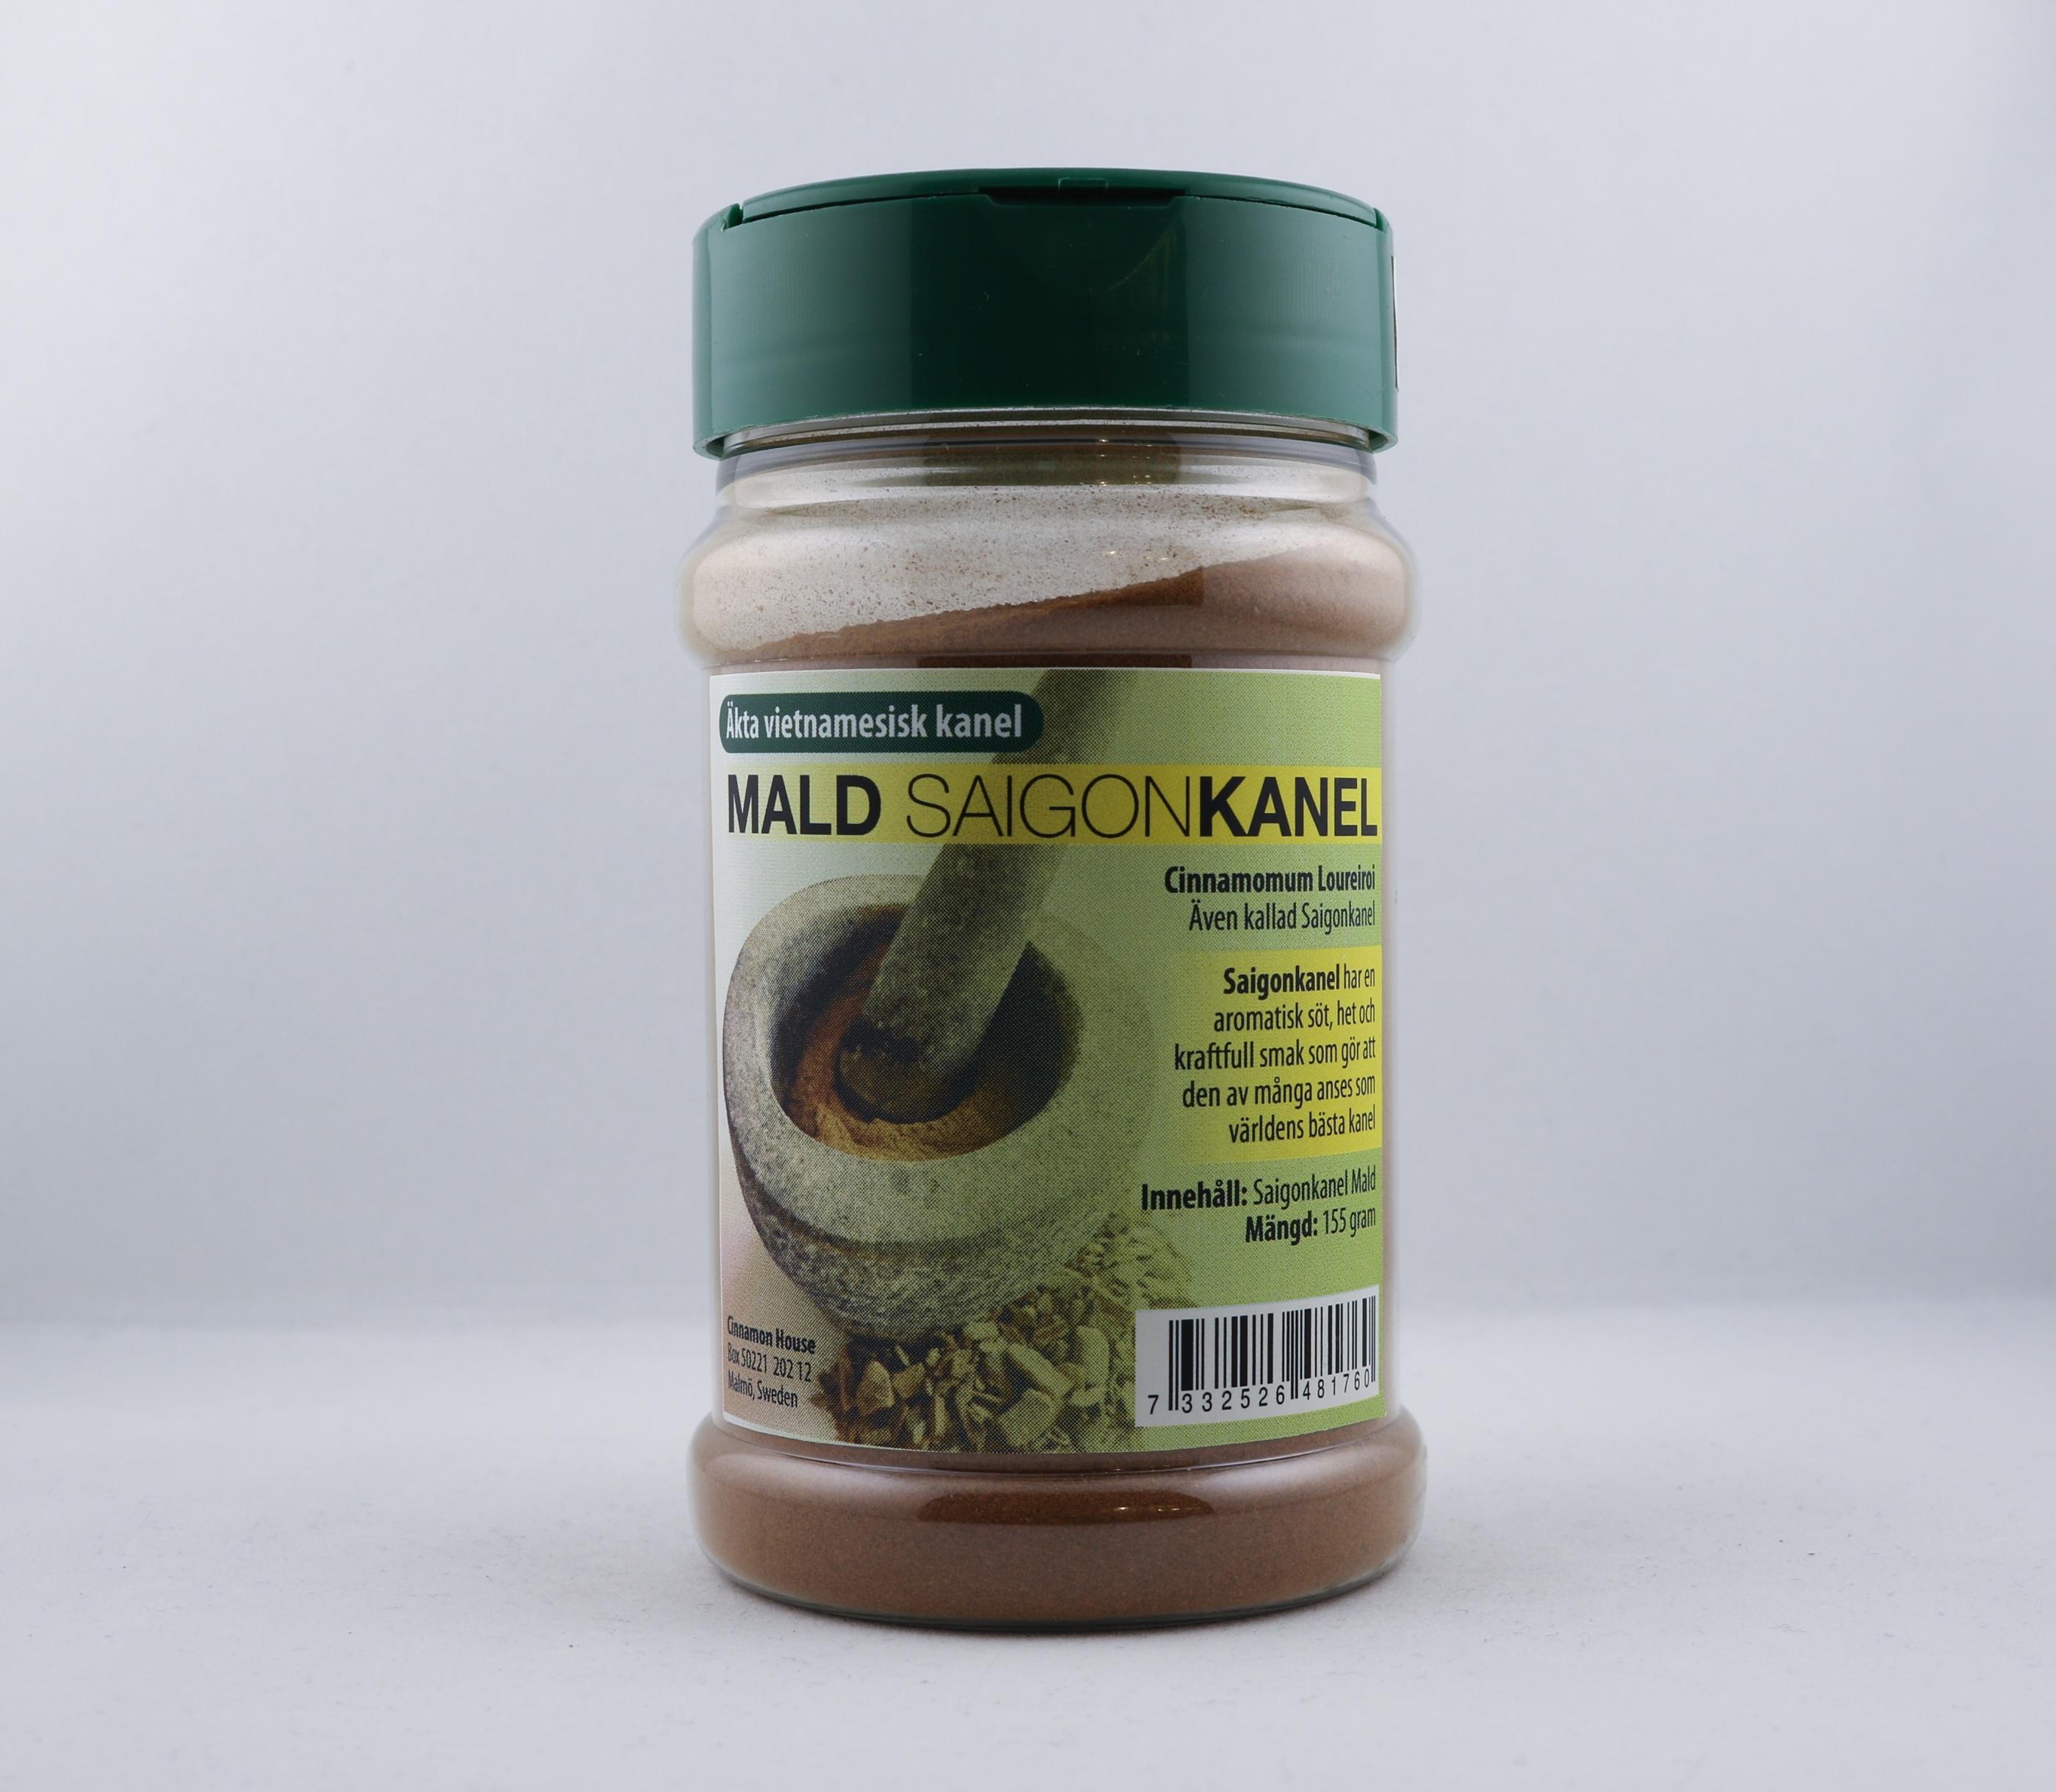 Äkta vietnamesisk kanel Mald Saigonkanel wellness ayurveda halmstad sweden svensk krydda